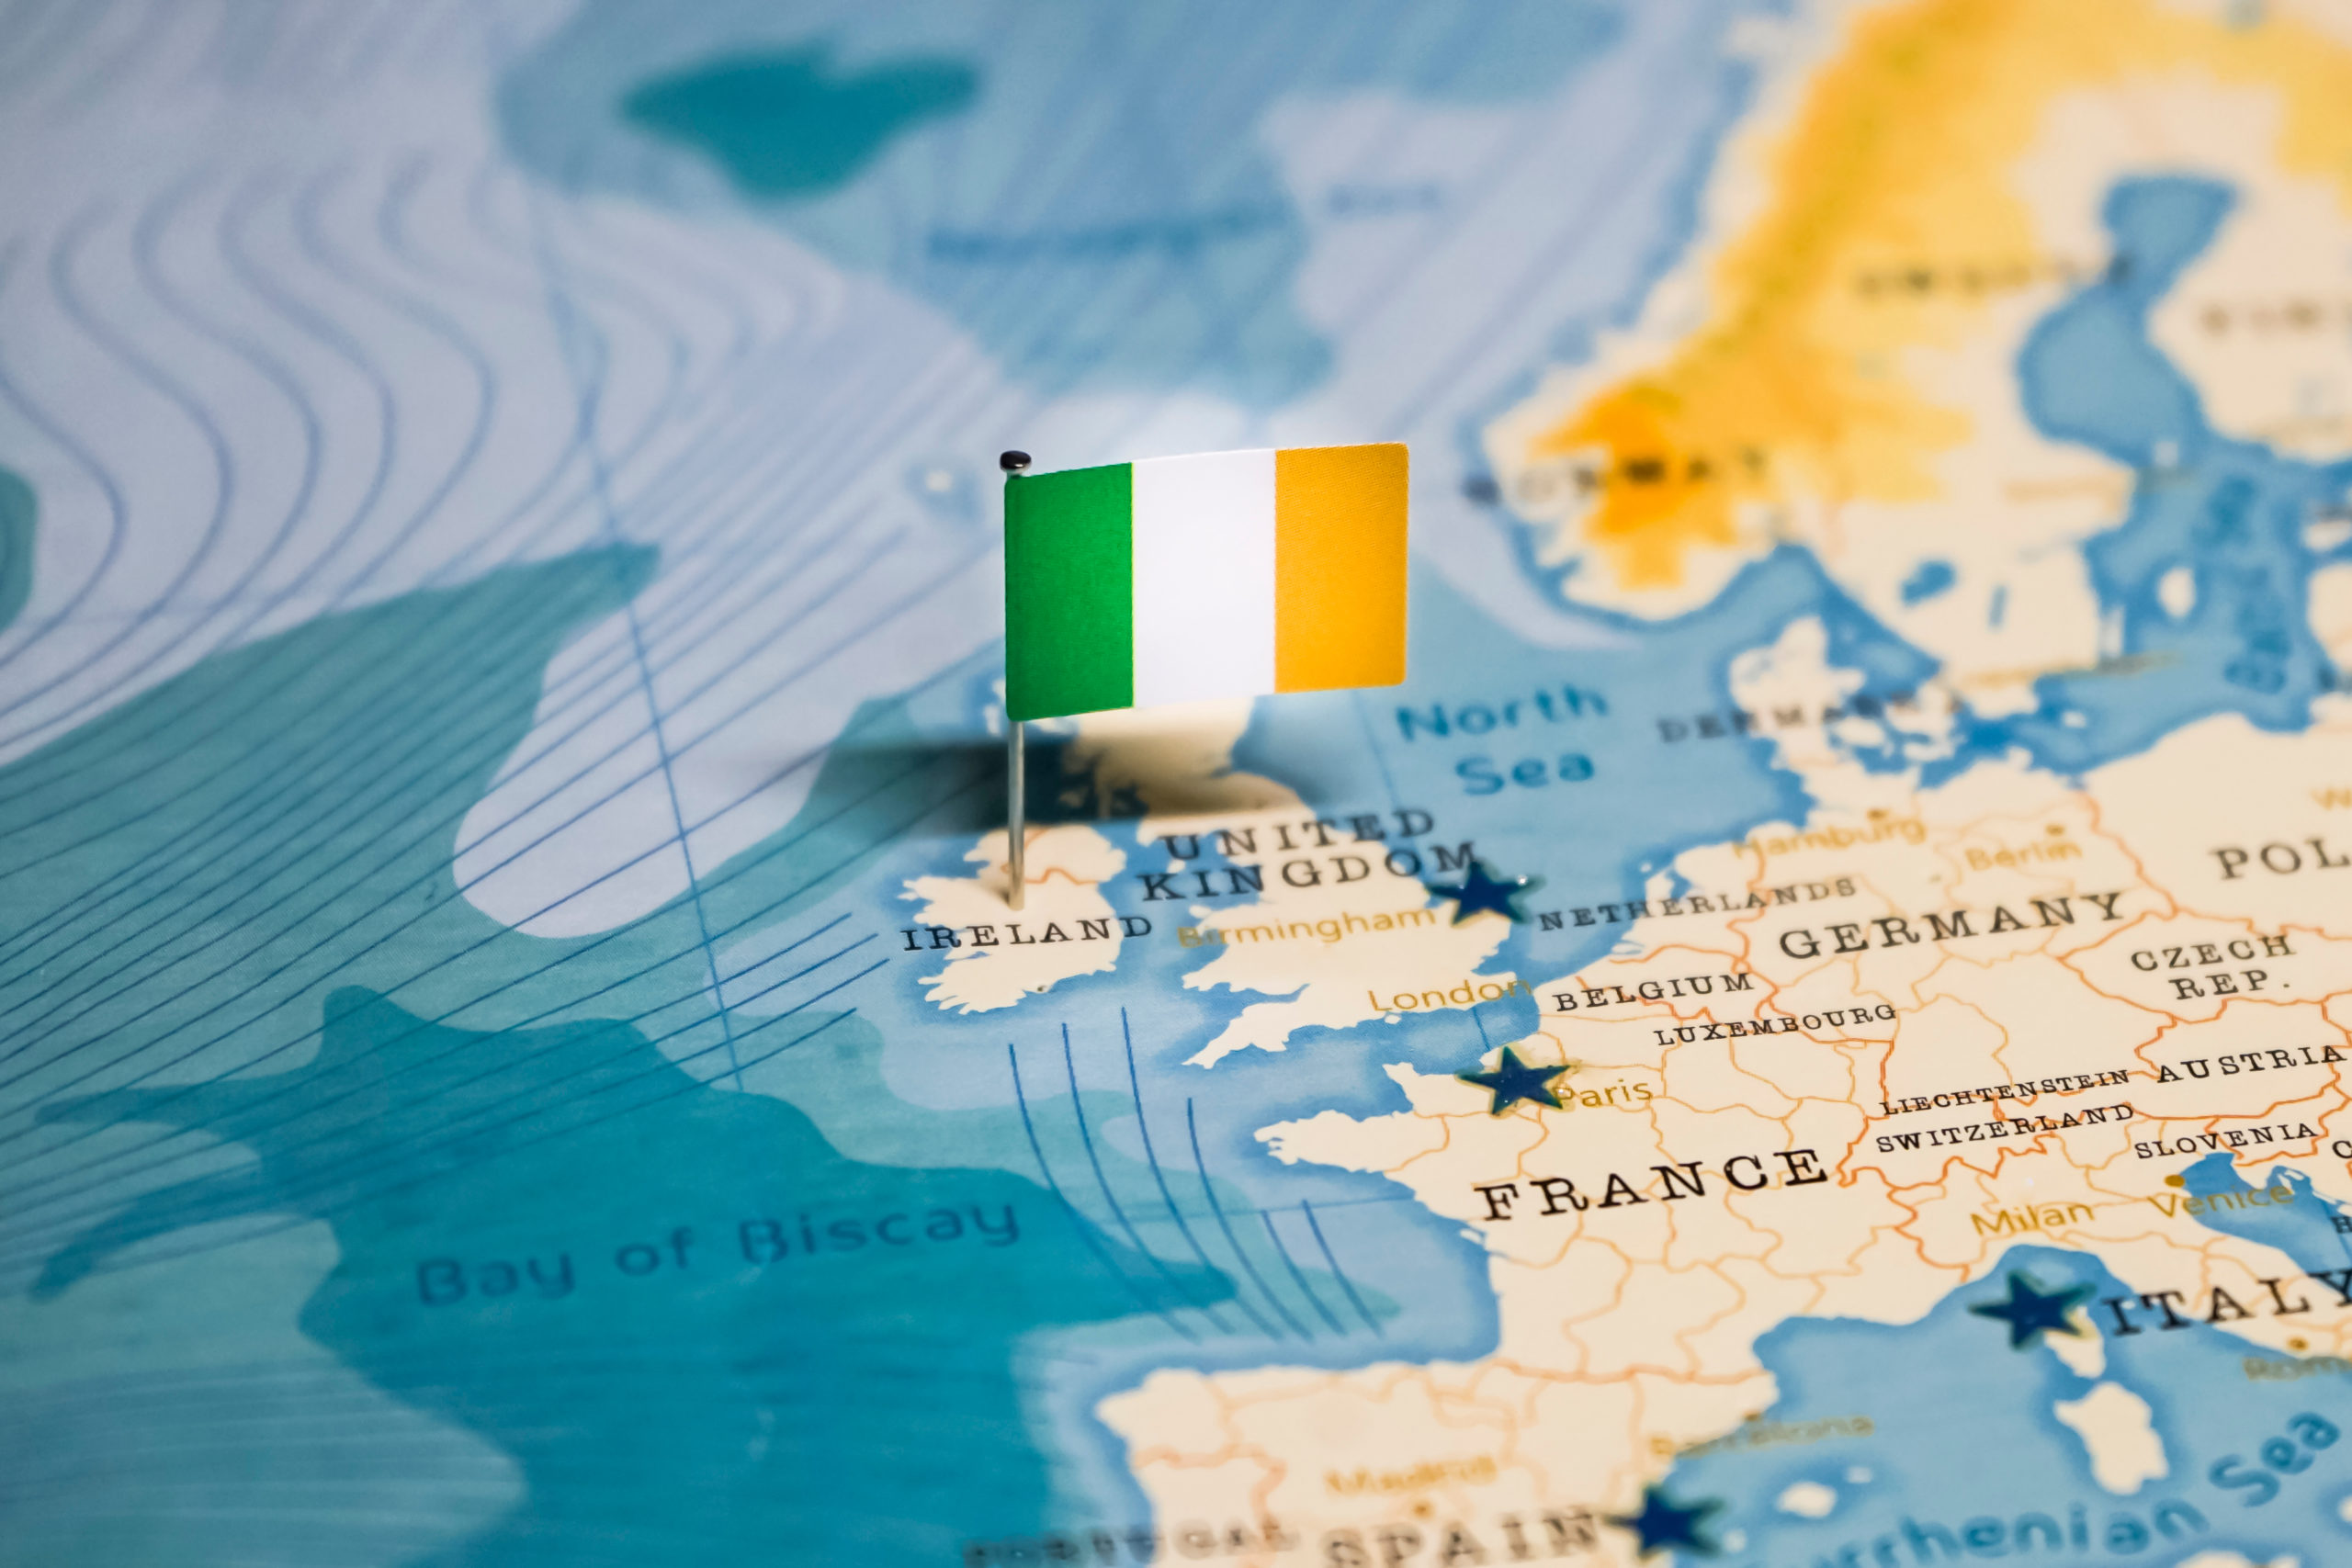 Thumbnail BAS goes Irish